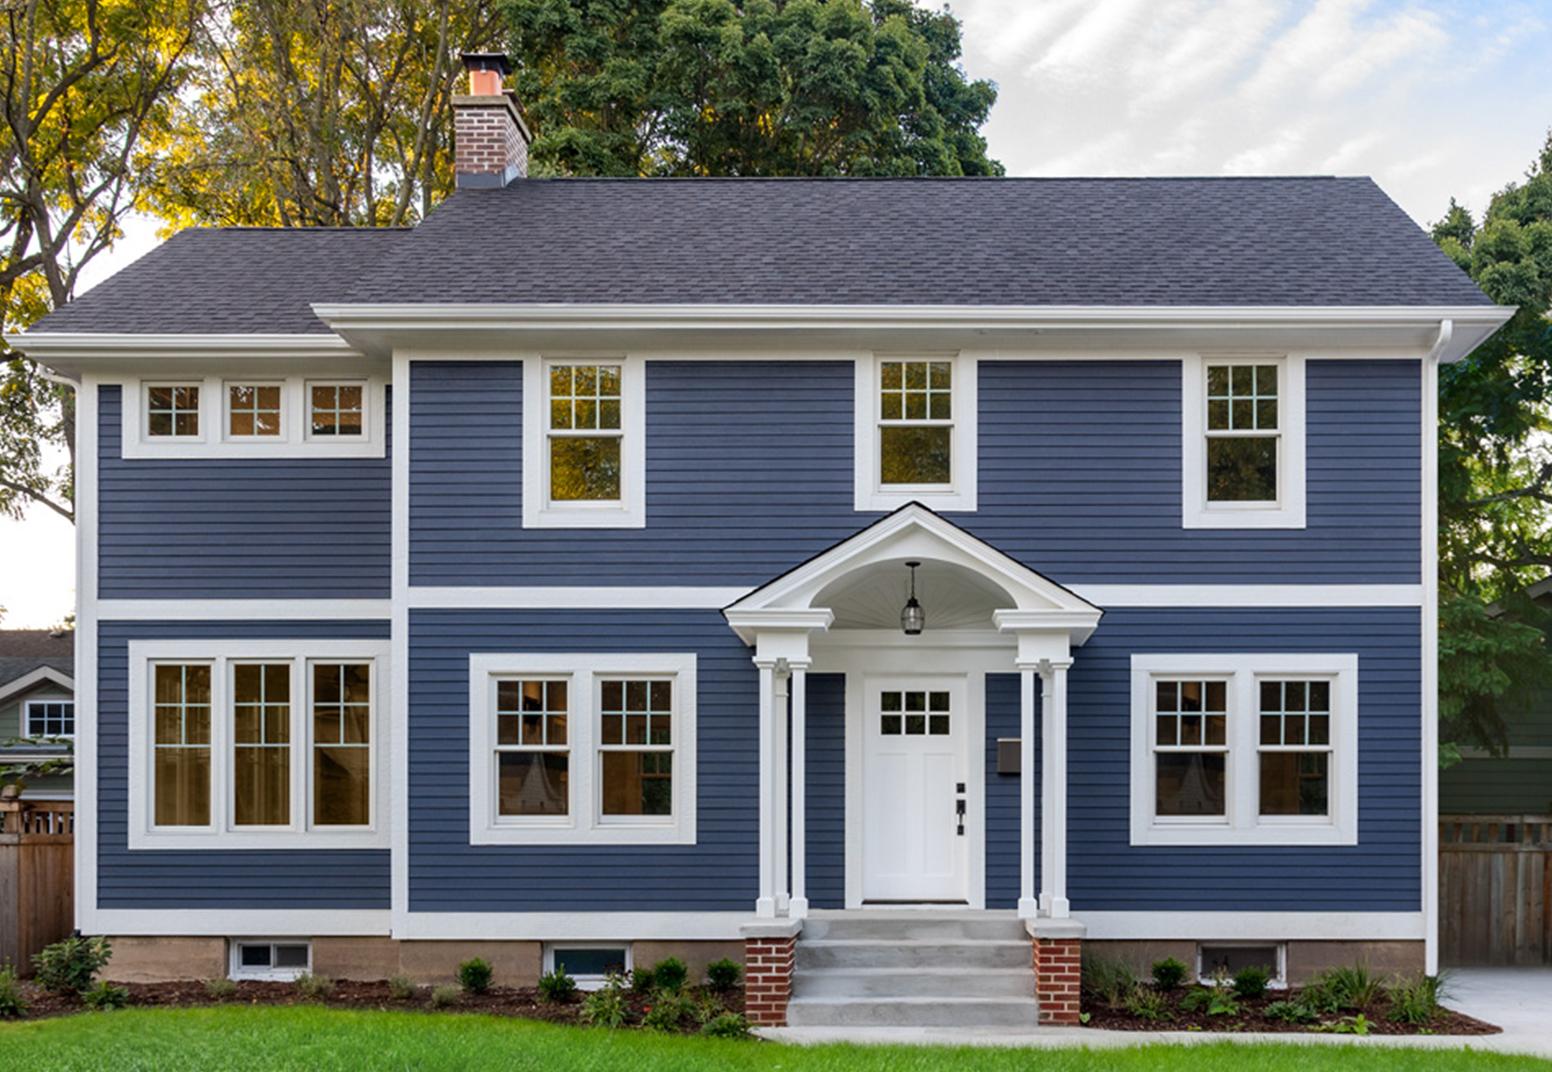 Siding Benefits for Your Home Exterior